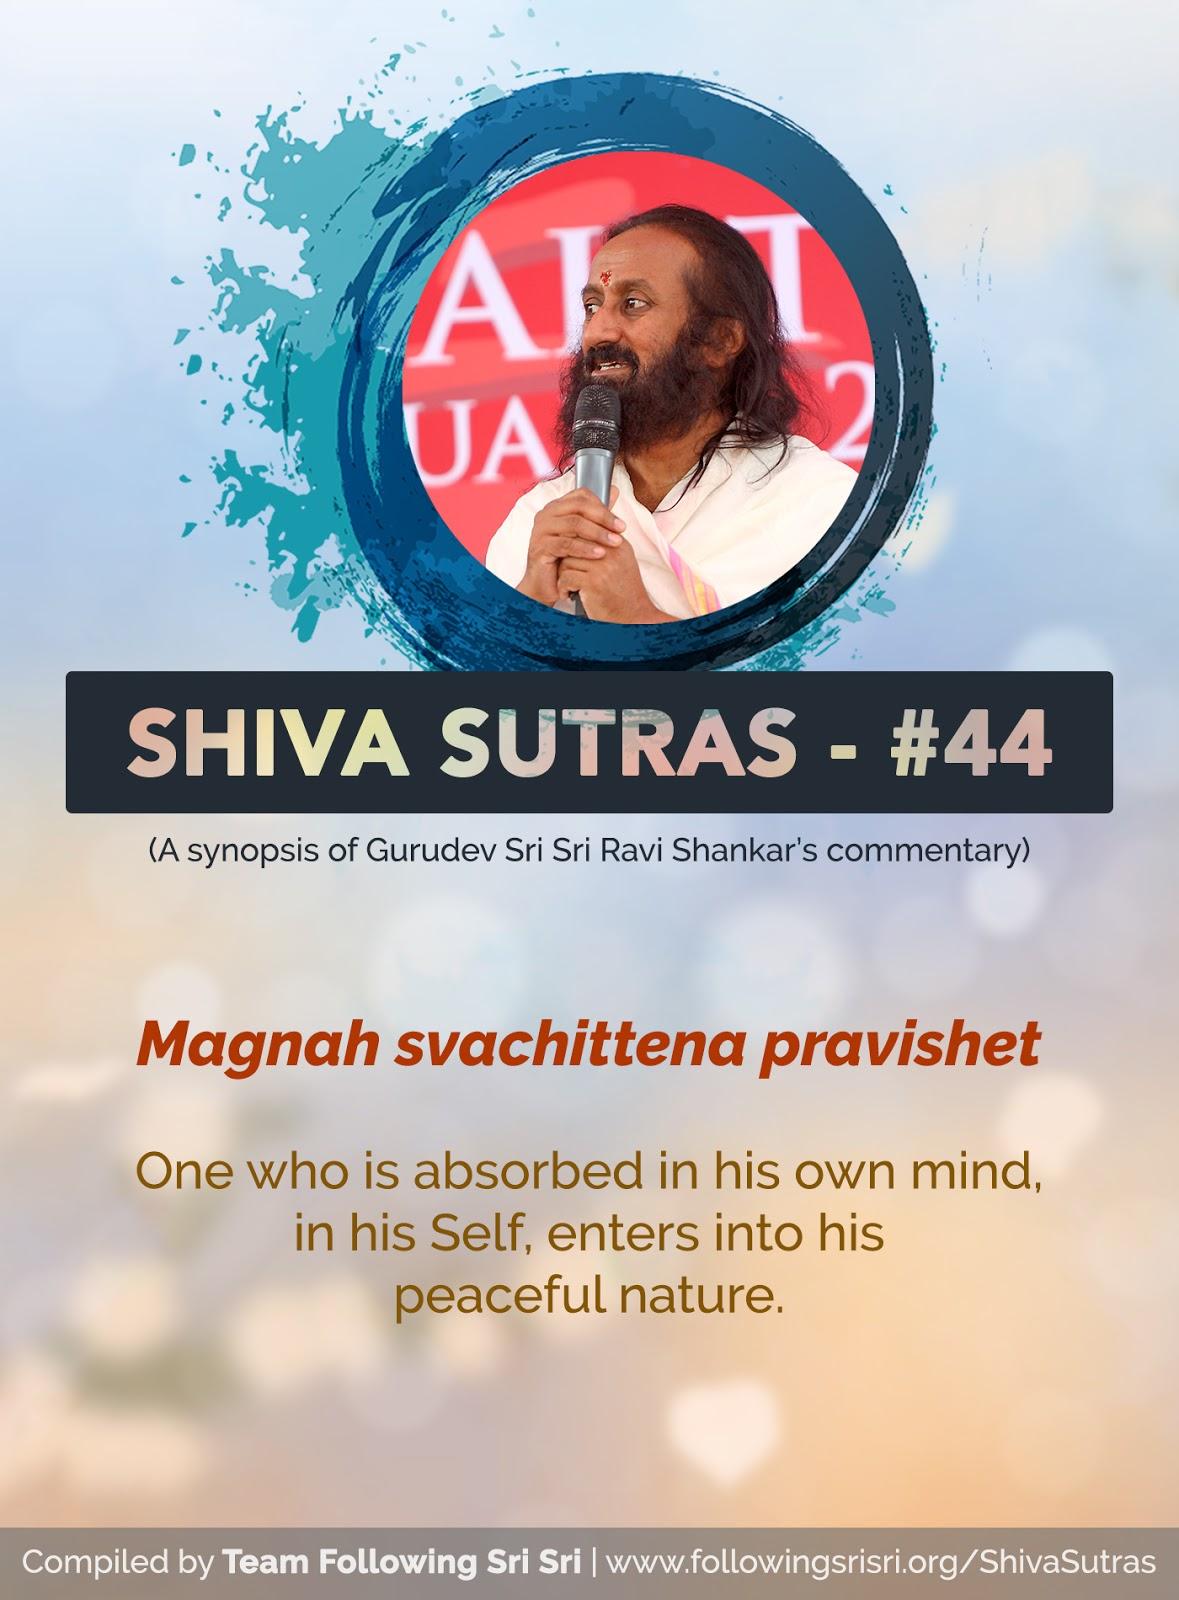 Shiva Sutras - Sutra 44